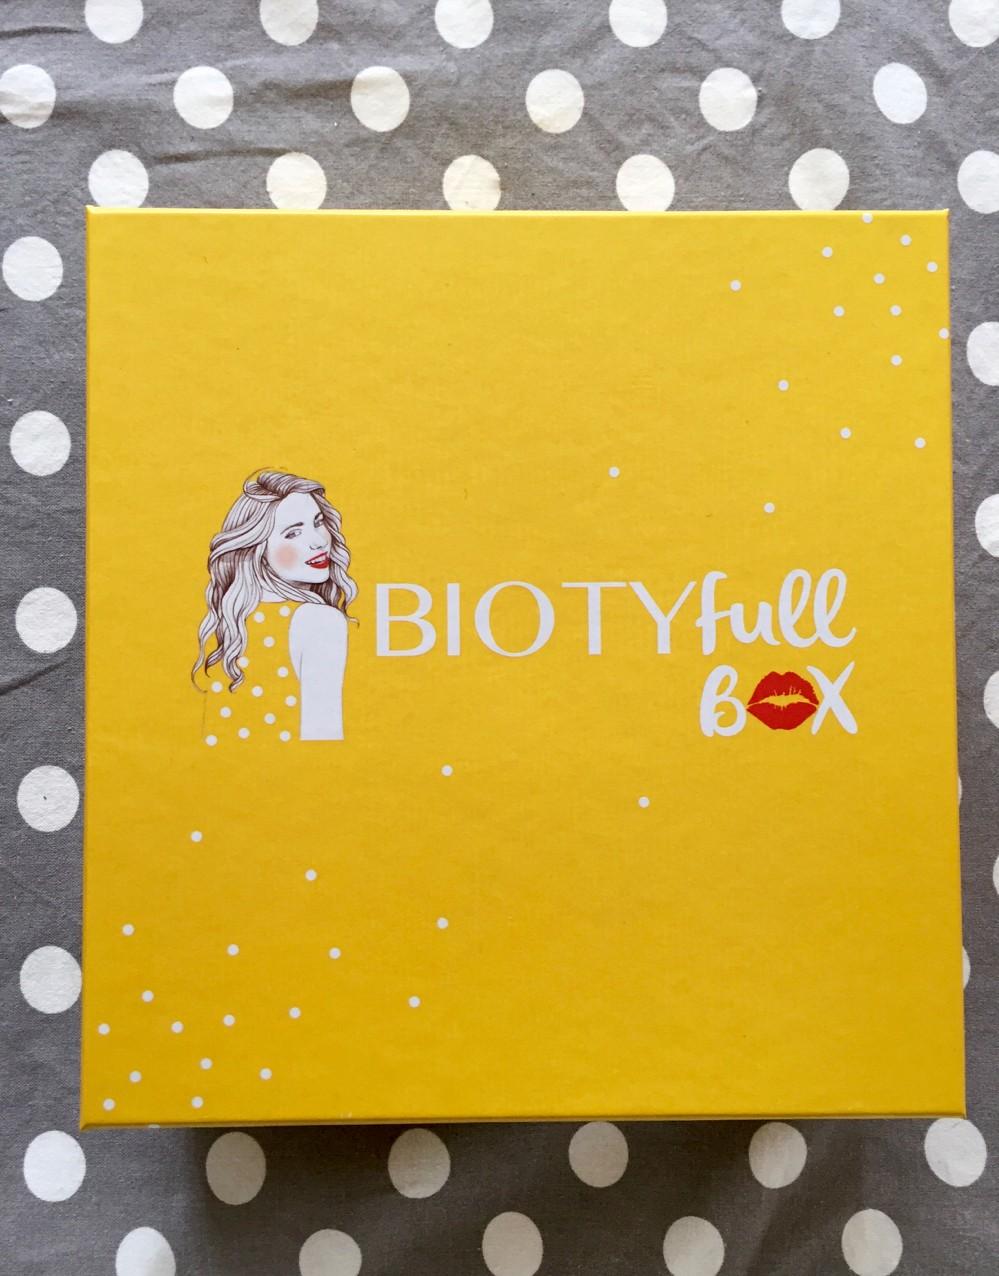 Biotyfull Box Janvier 2016 - 1